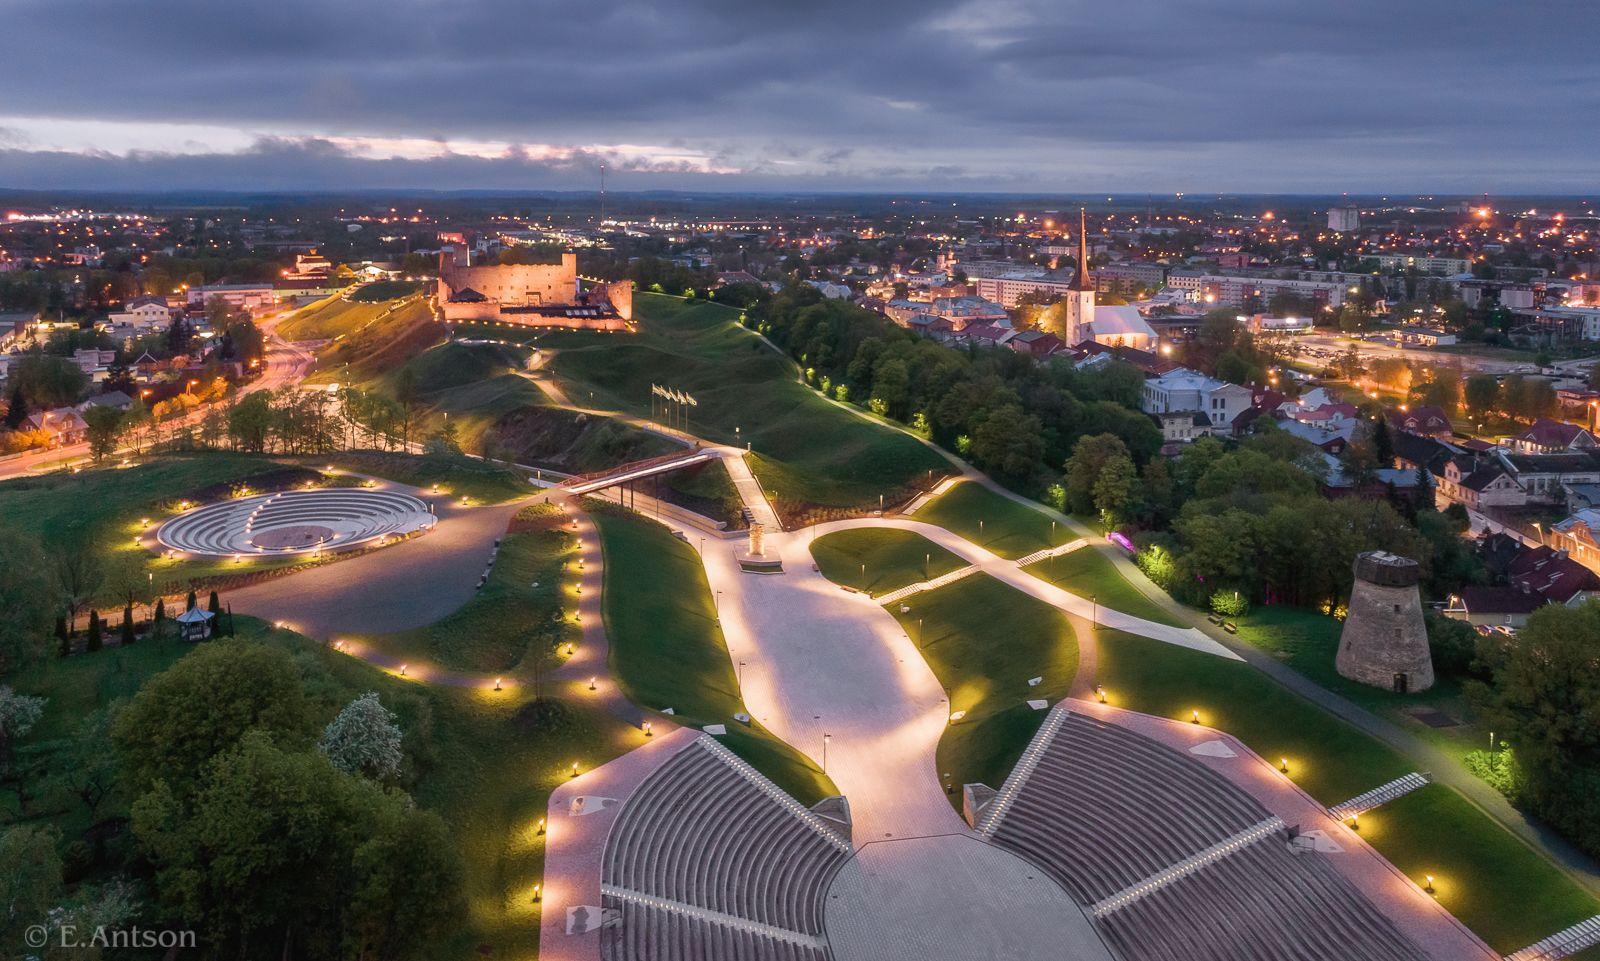 город, архитектура, эстония, Antson Elvis